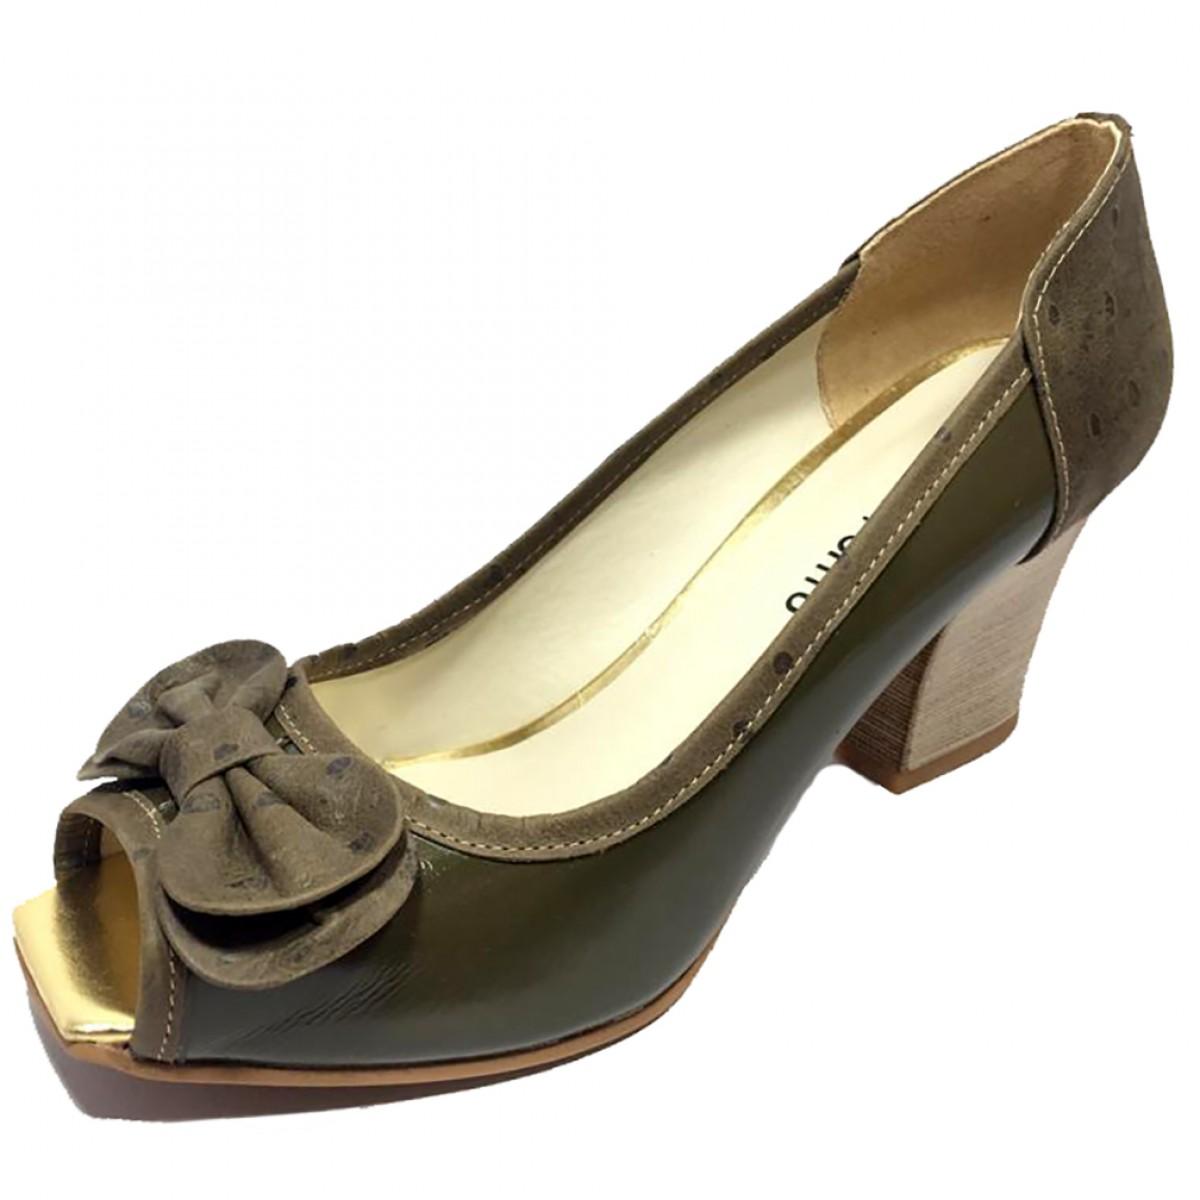 0d9dba1918 Sapato Feminino Peep Toe Cia do Porto Avestruz Musgo - Compre Agora ...